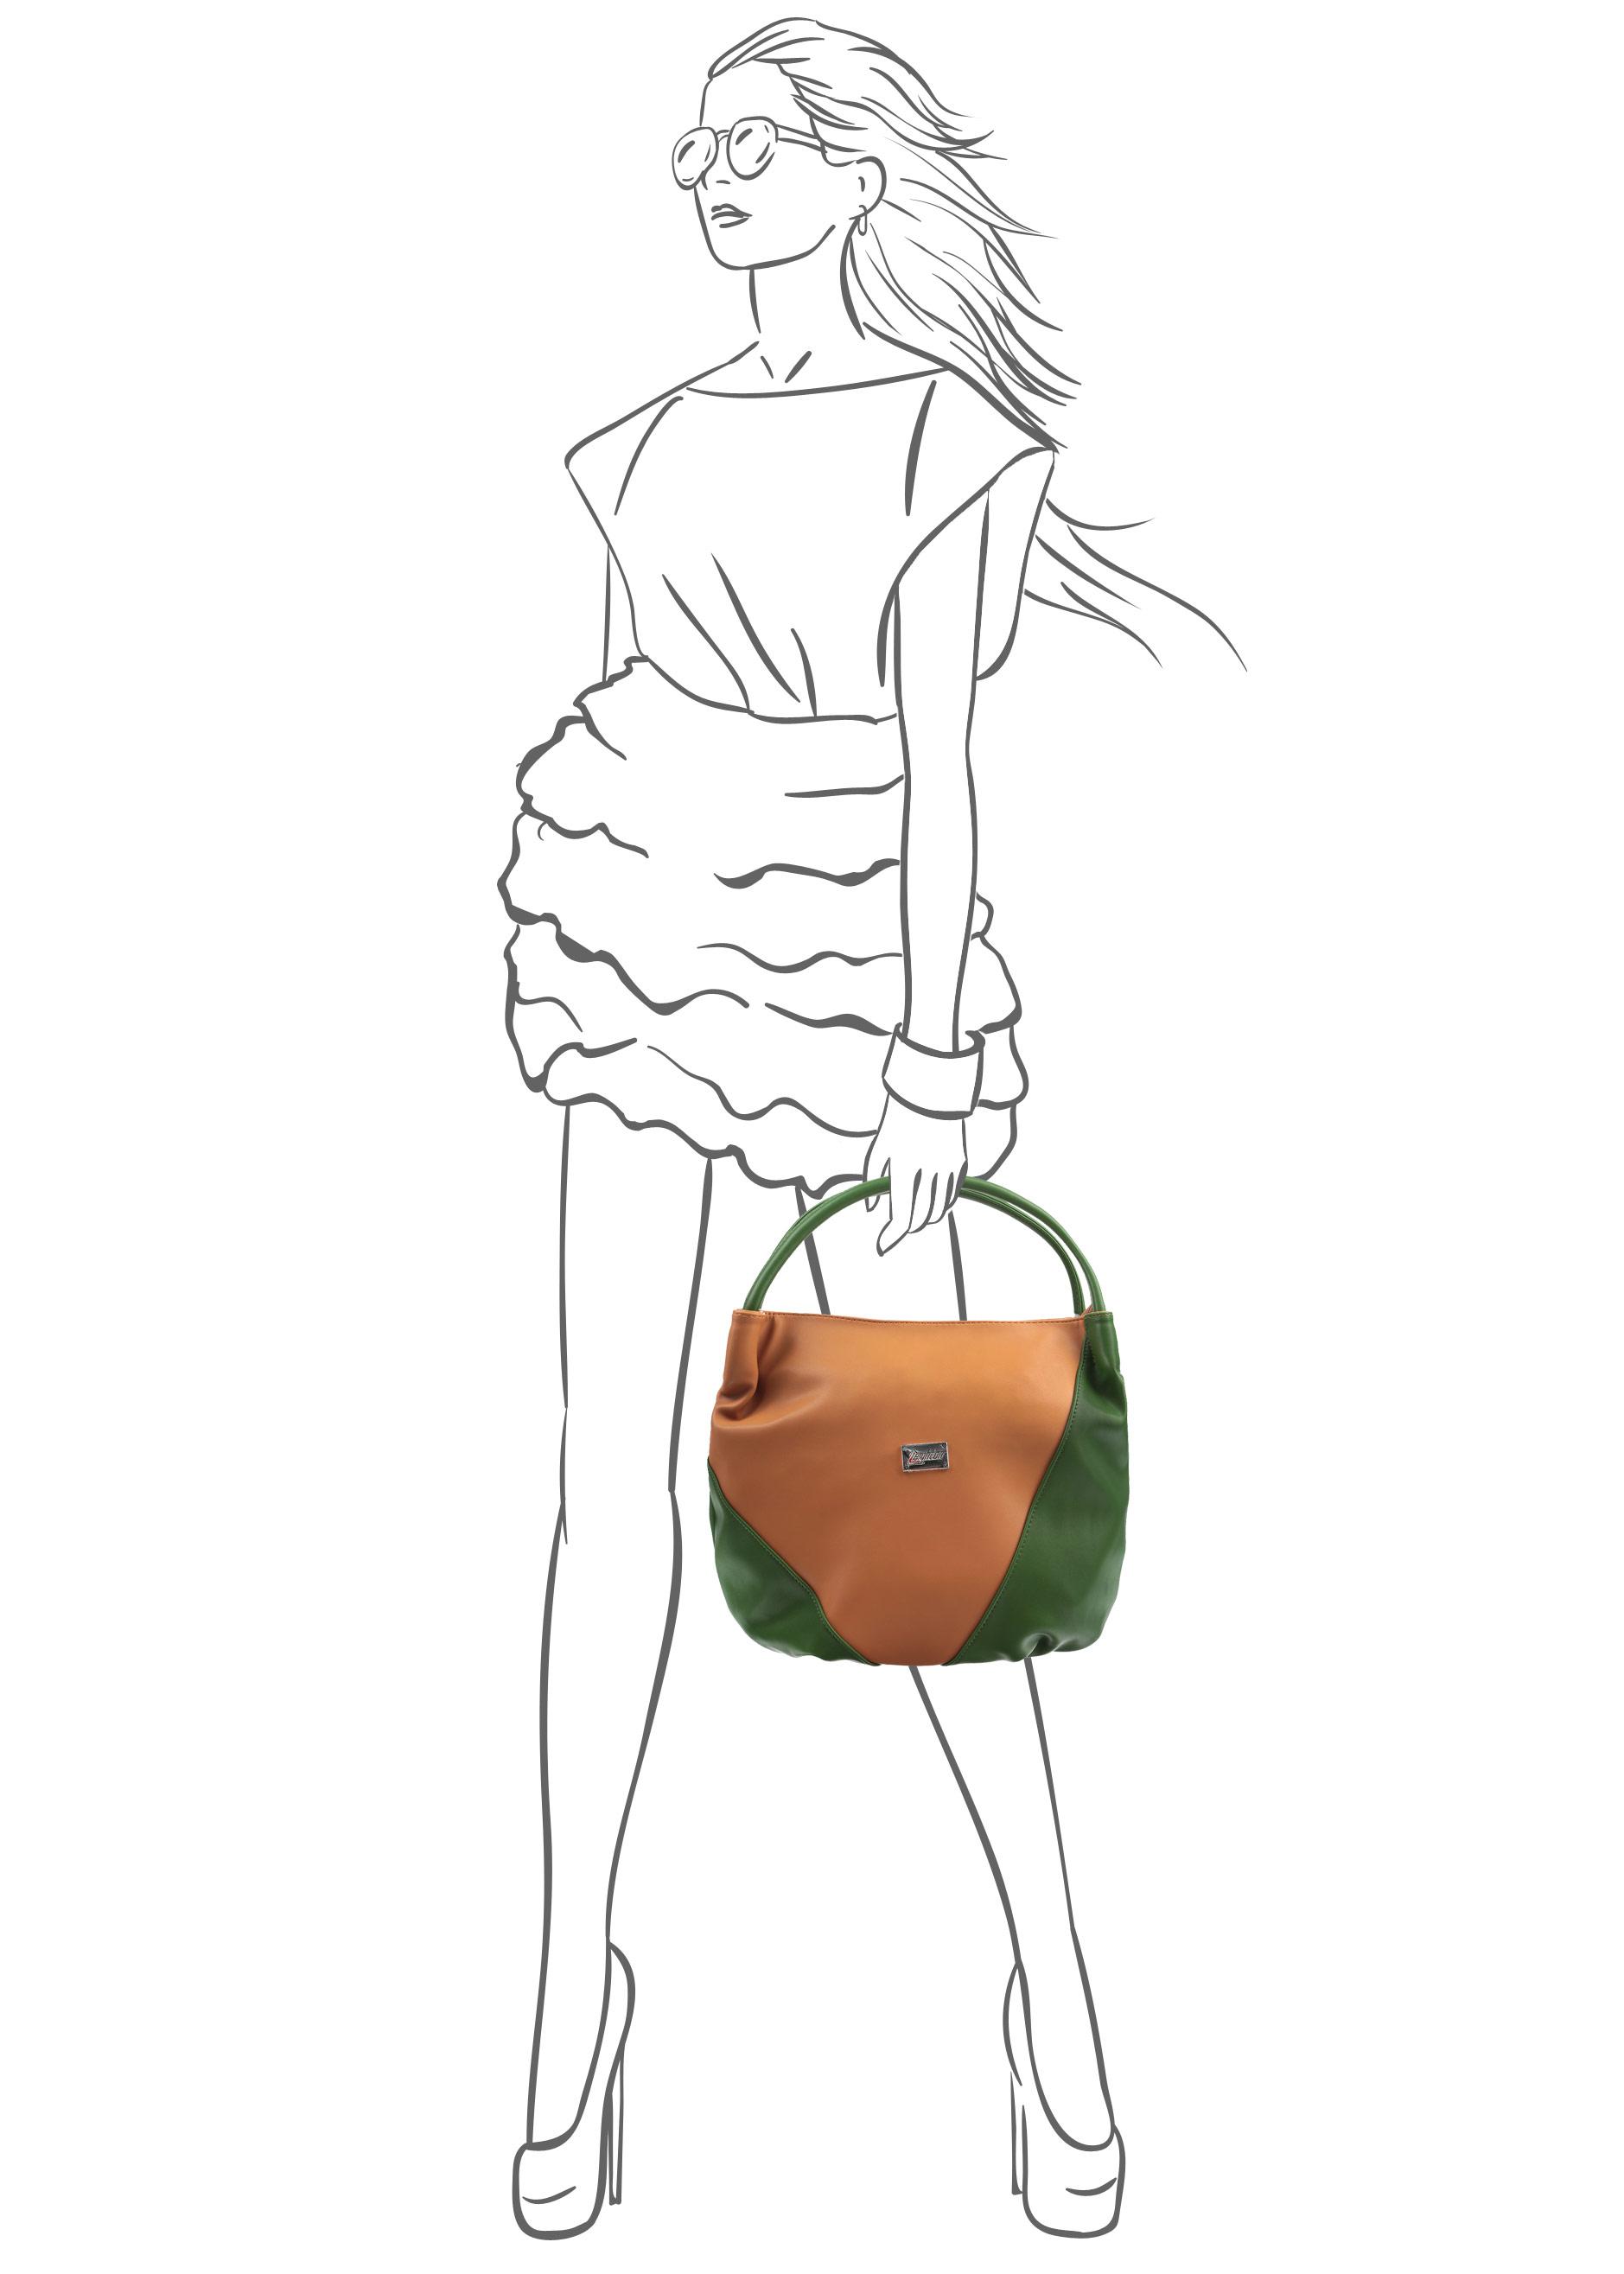 Сумка женская Leighton, цвет: темно-бежевый, зеленый. 350192-1092/805/1092/510 ( 350192-1092/805/1092/510 )